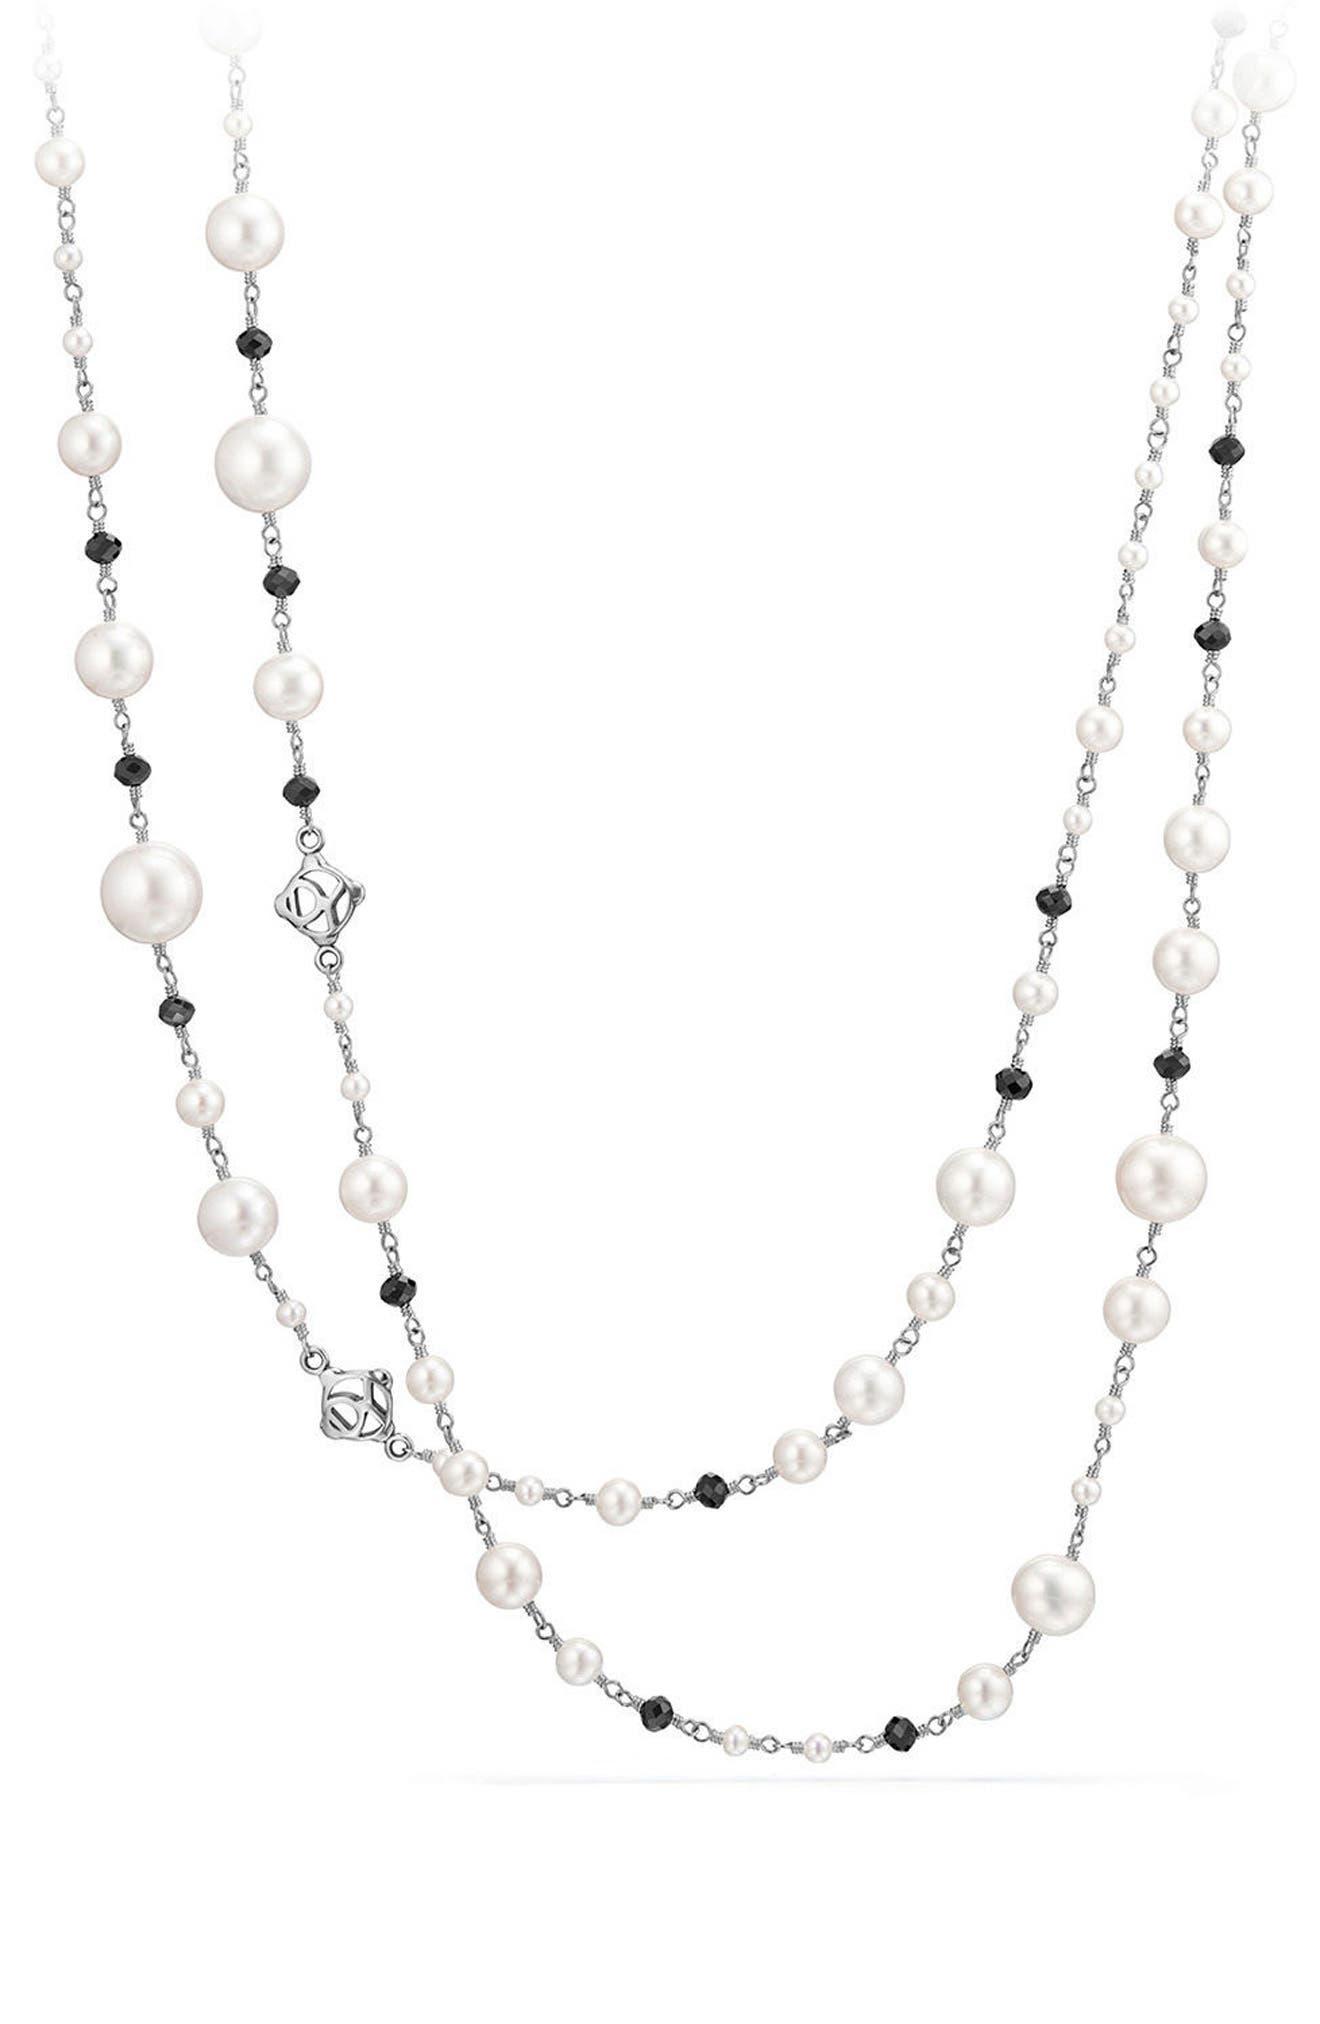 Solari Pearl & Bead Necklace,                         Main,                         color, PEARL/ BLACK SPINEL